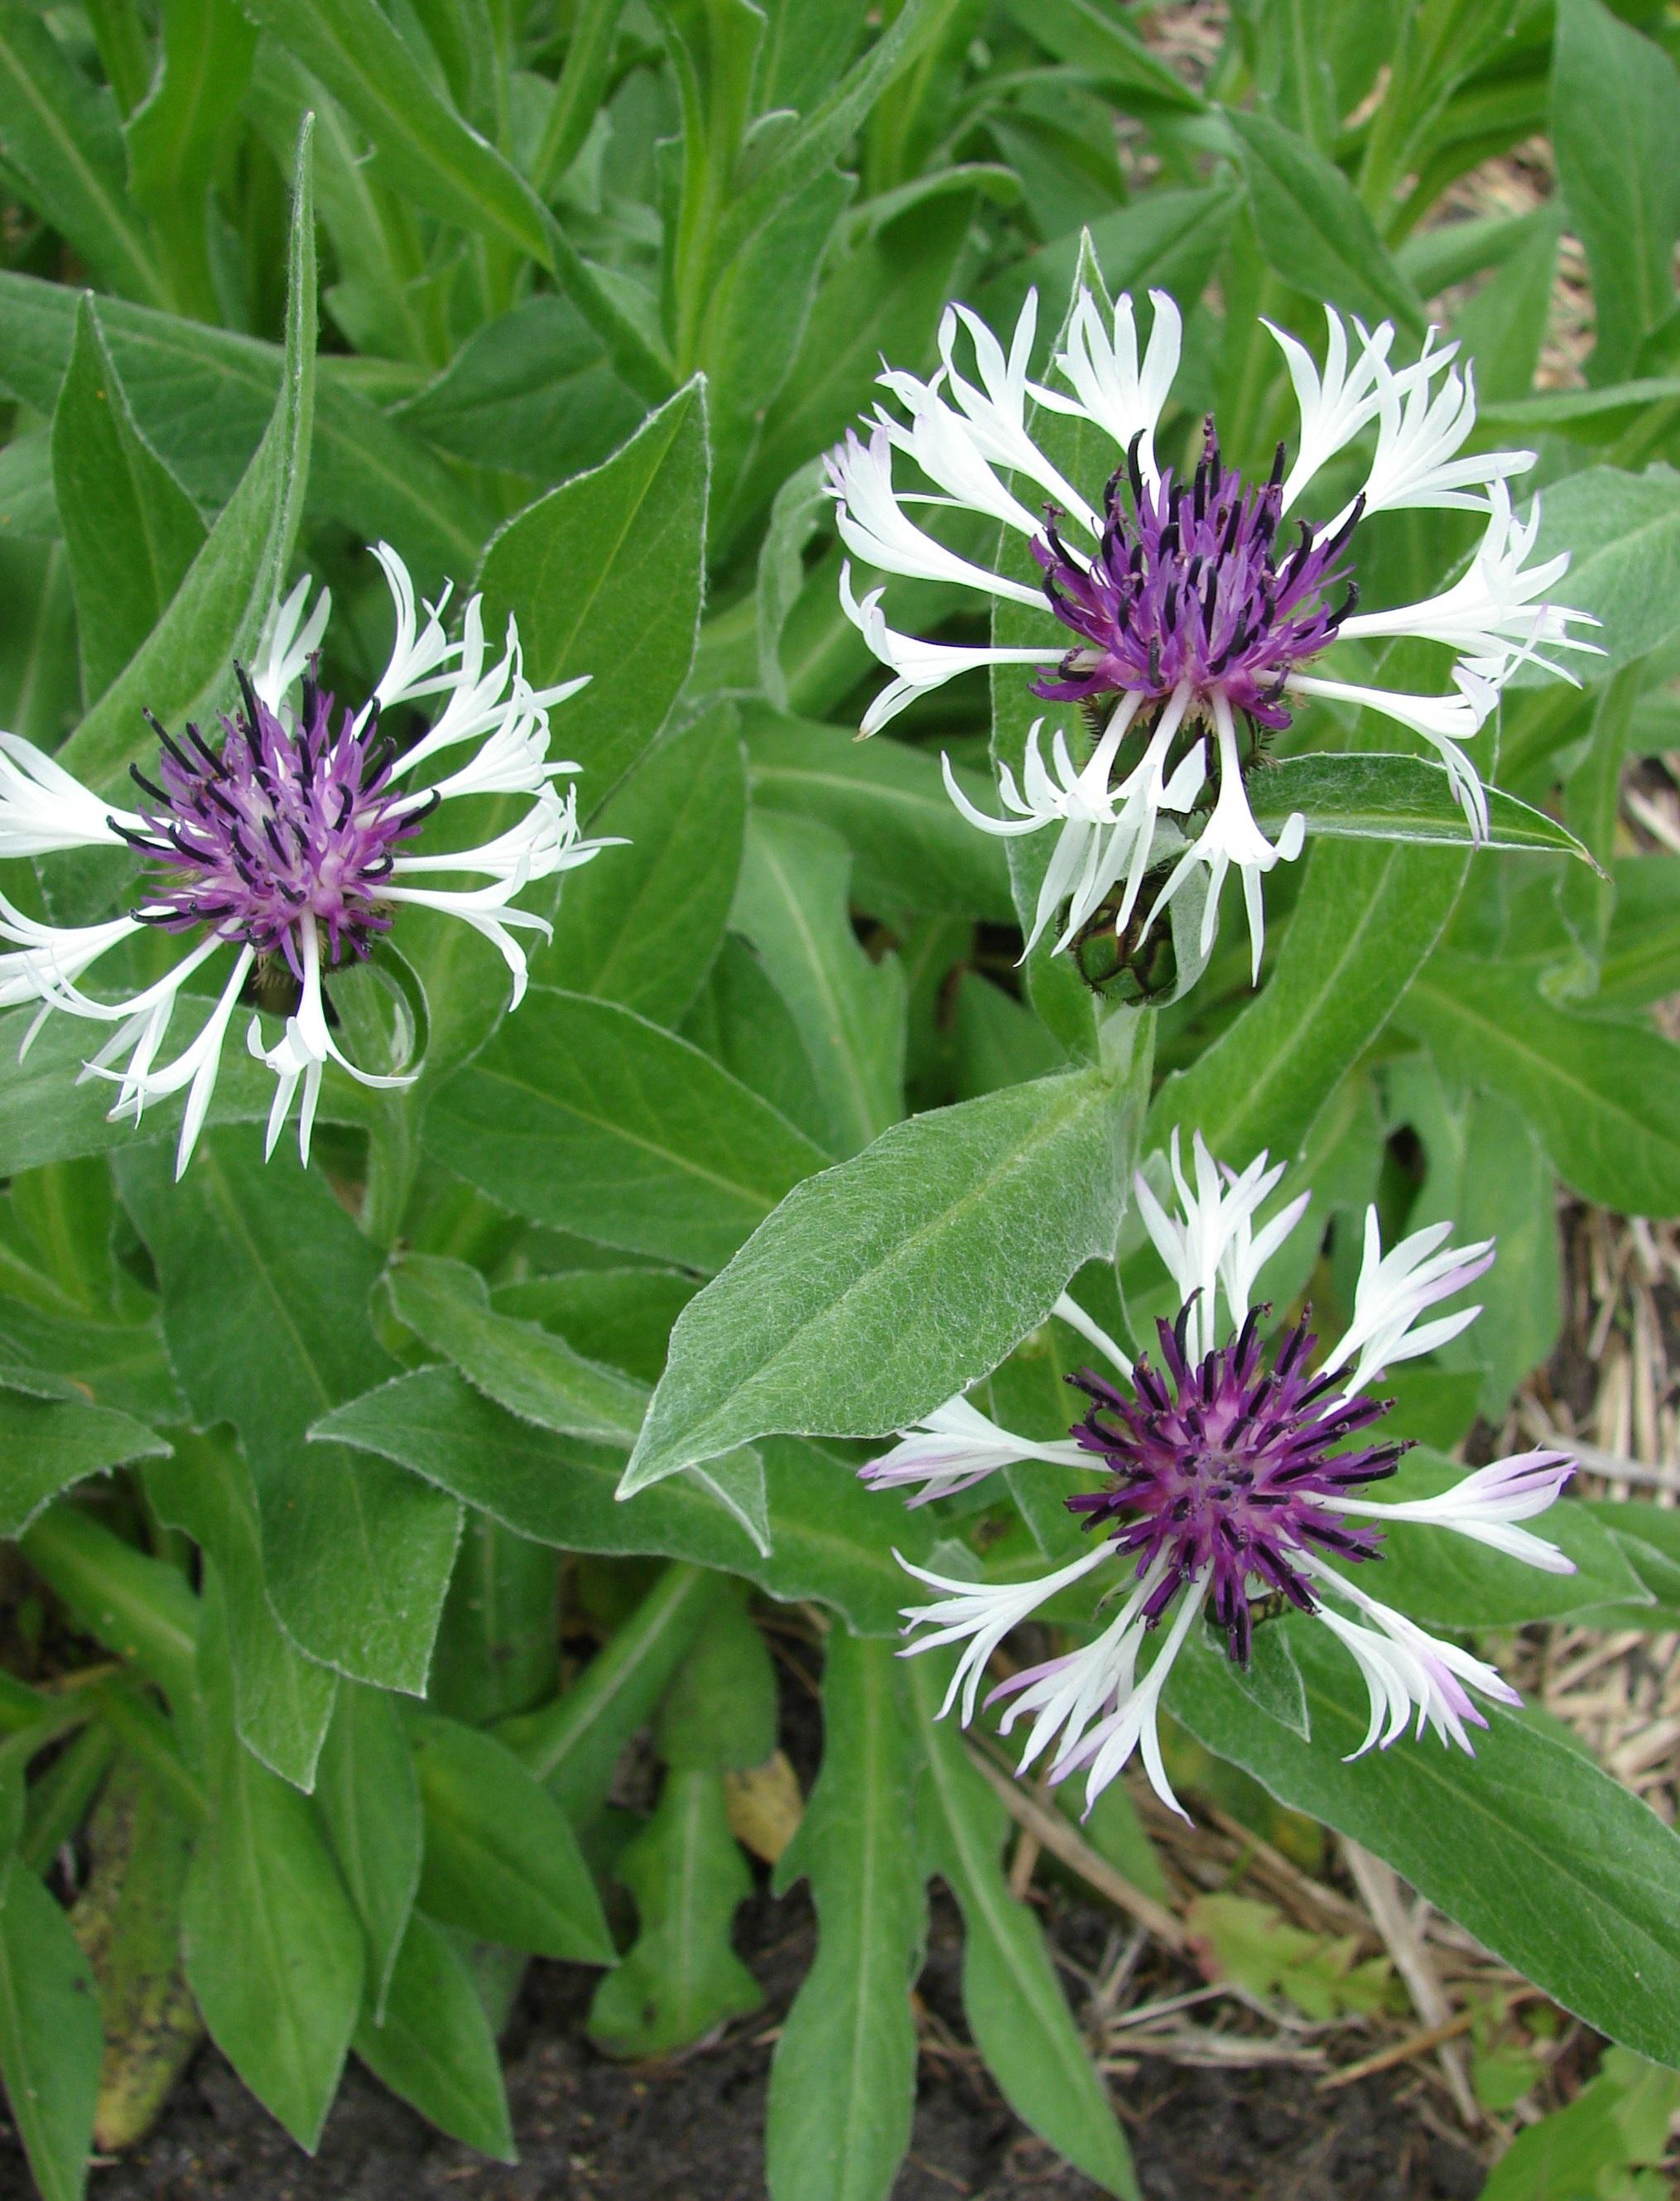 Nature Plant Flower Summer Herb Produce Botany Garden Flora Plants Aster  Thistle Centaurea Botanic Flowering Plant